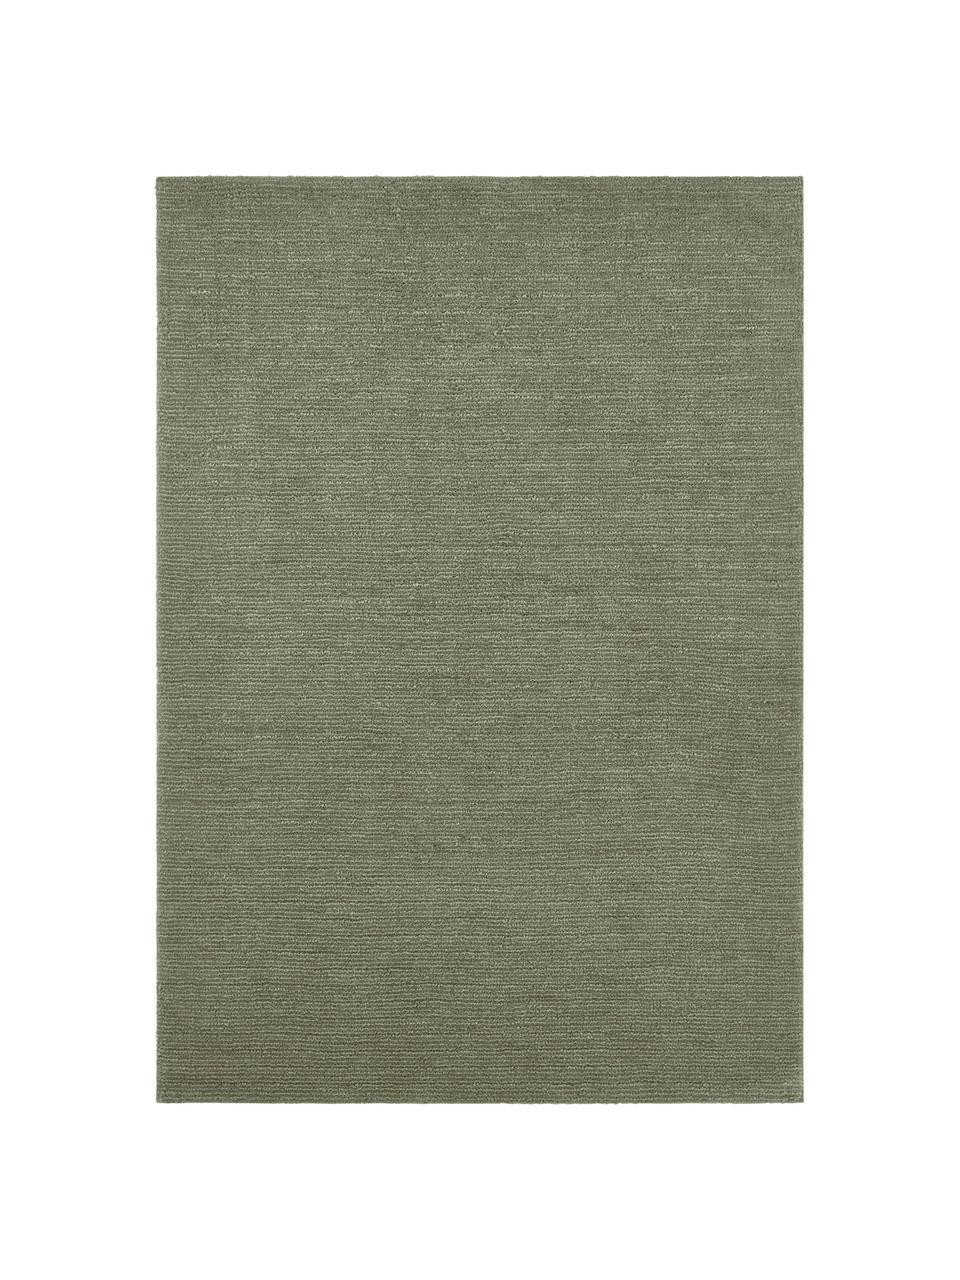 Tappeto verde muschio Supersoft, 100% poliestere, Verde muschio, Larg. 200 x Lung. 290 cm (taglia L)